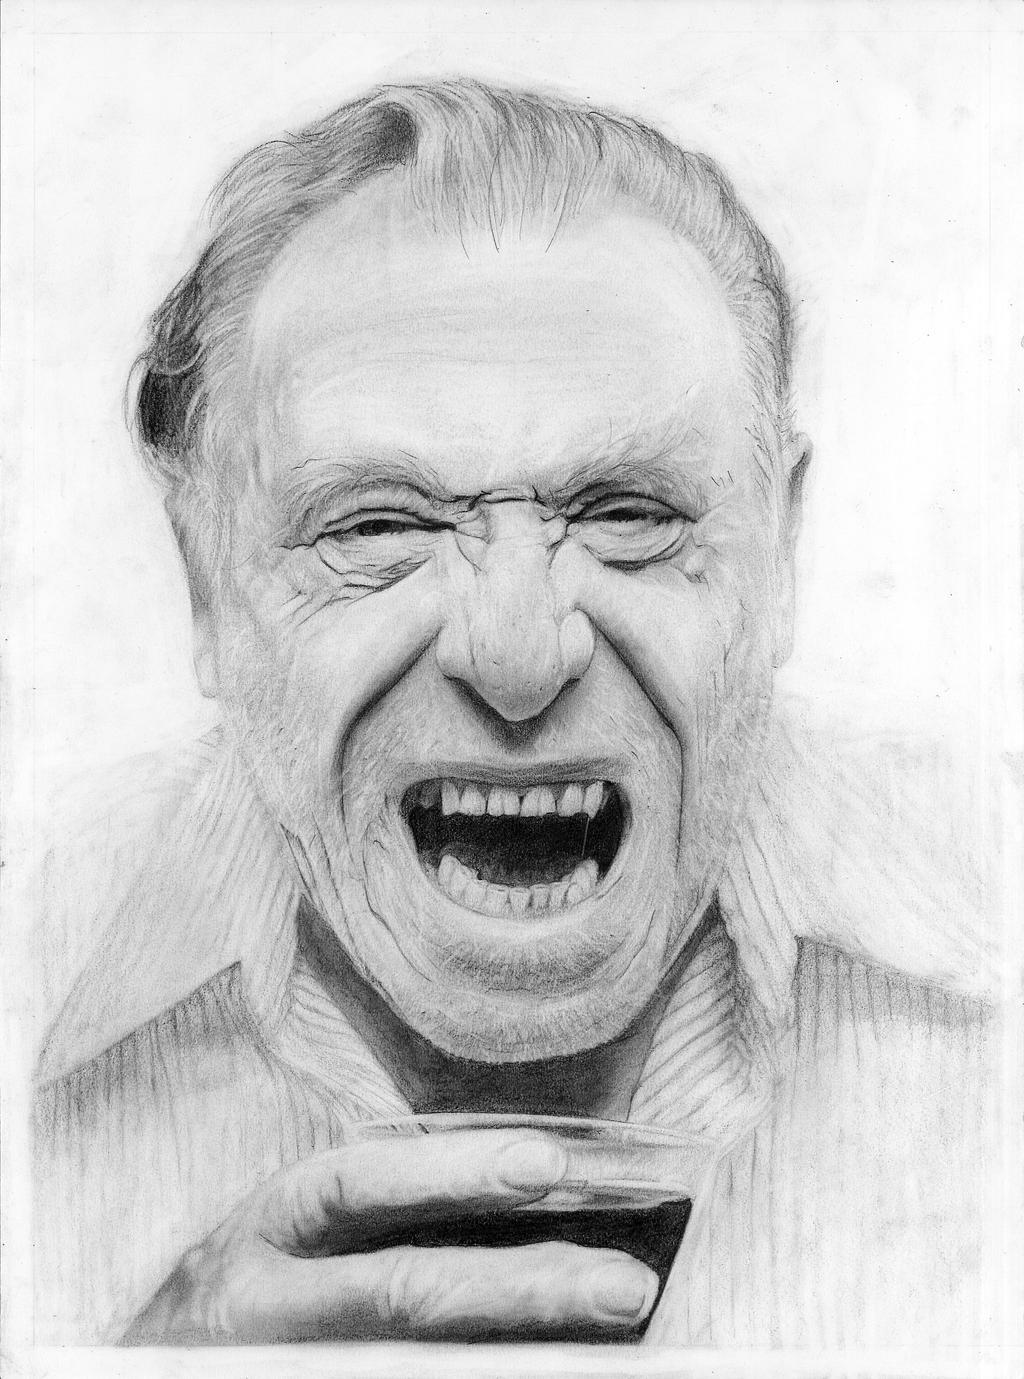 Henry Charles Bukowski by PakstraX Henry Charles Bukowski by PakstraX - henry_charles_bukowski_by_pakstrax-d5nlkc1